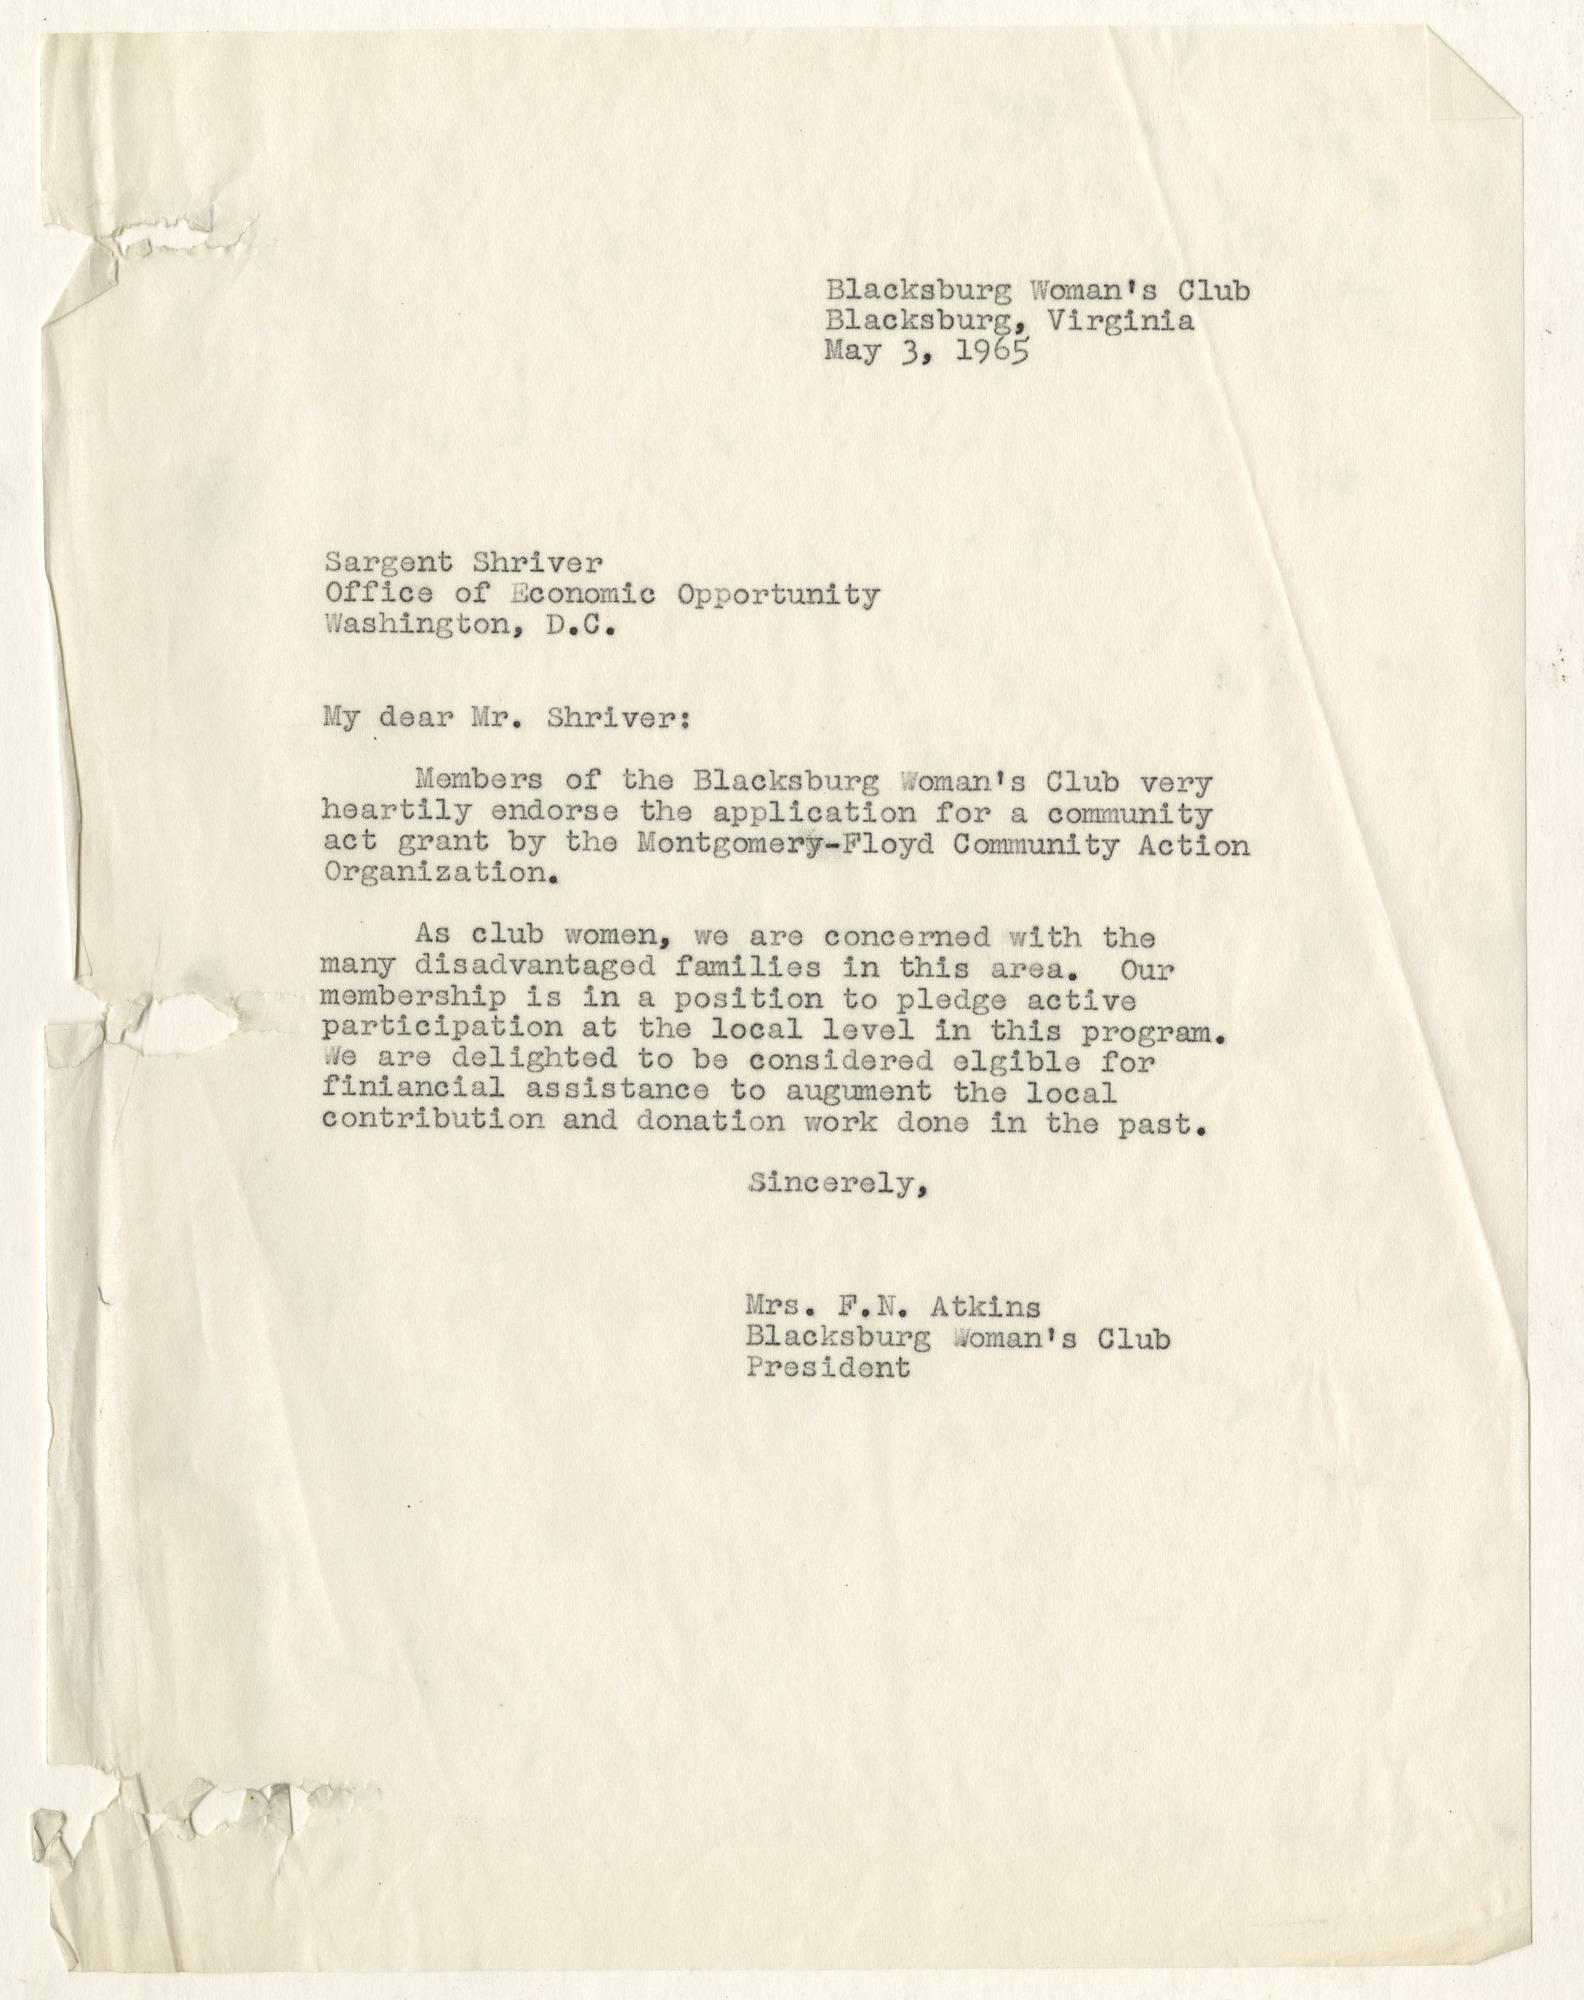 Ms1963-002_BlacksburgWomansClub_B1F1_Correspondence_1965_0505.jpg